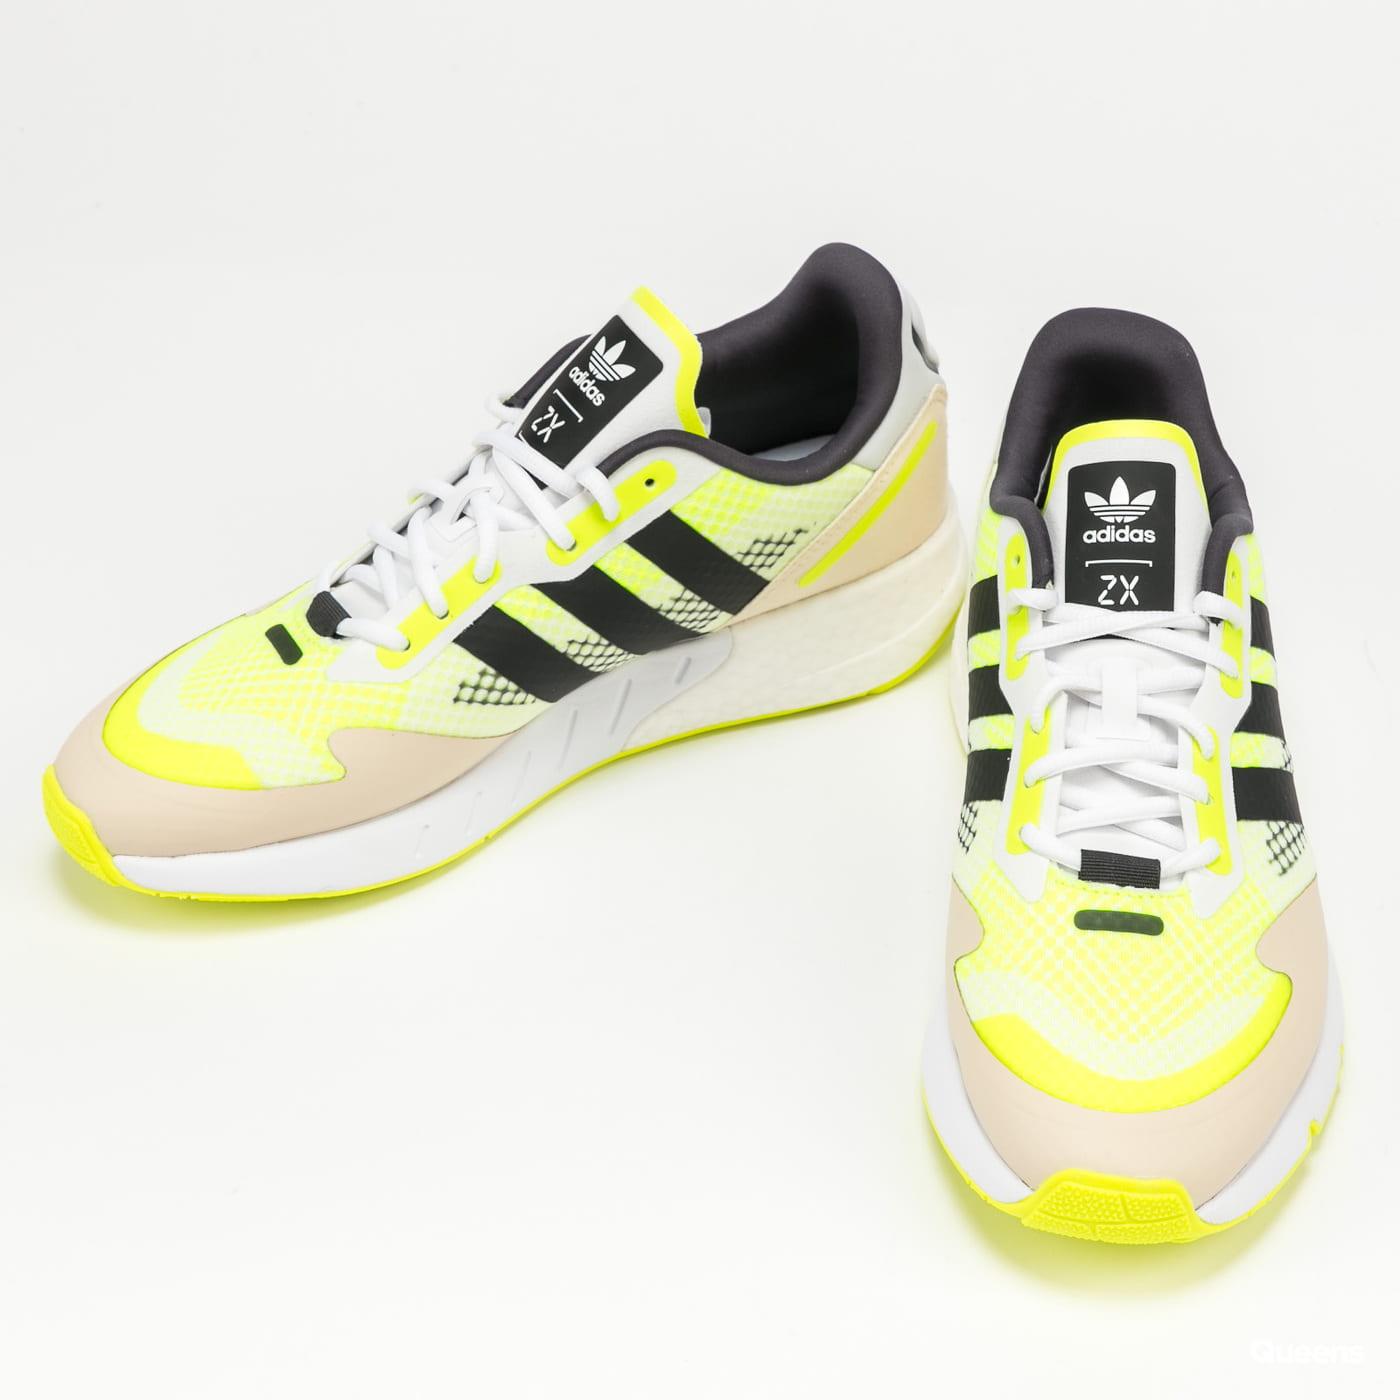 adidas Originals ZX 1K Boost ftwwht / carbo / wwht